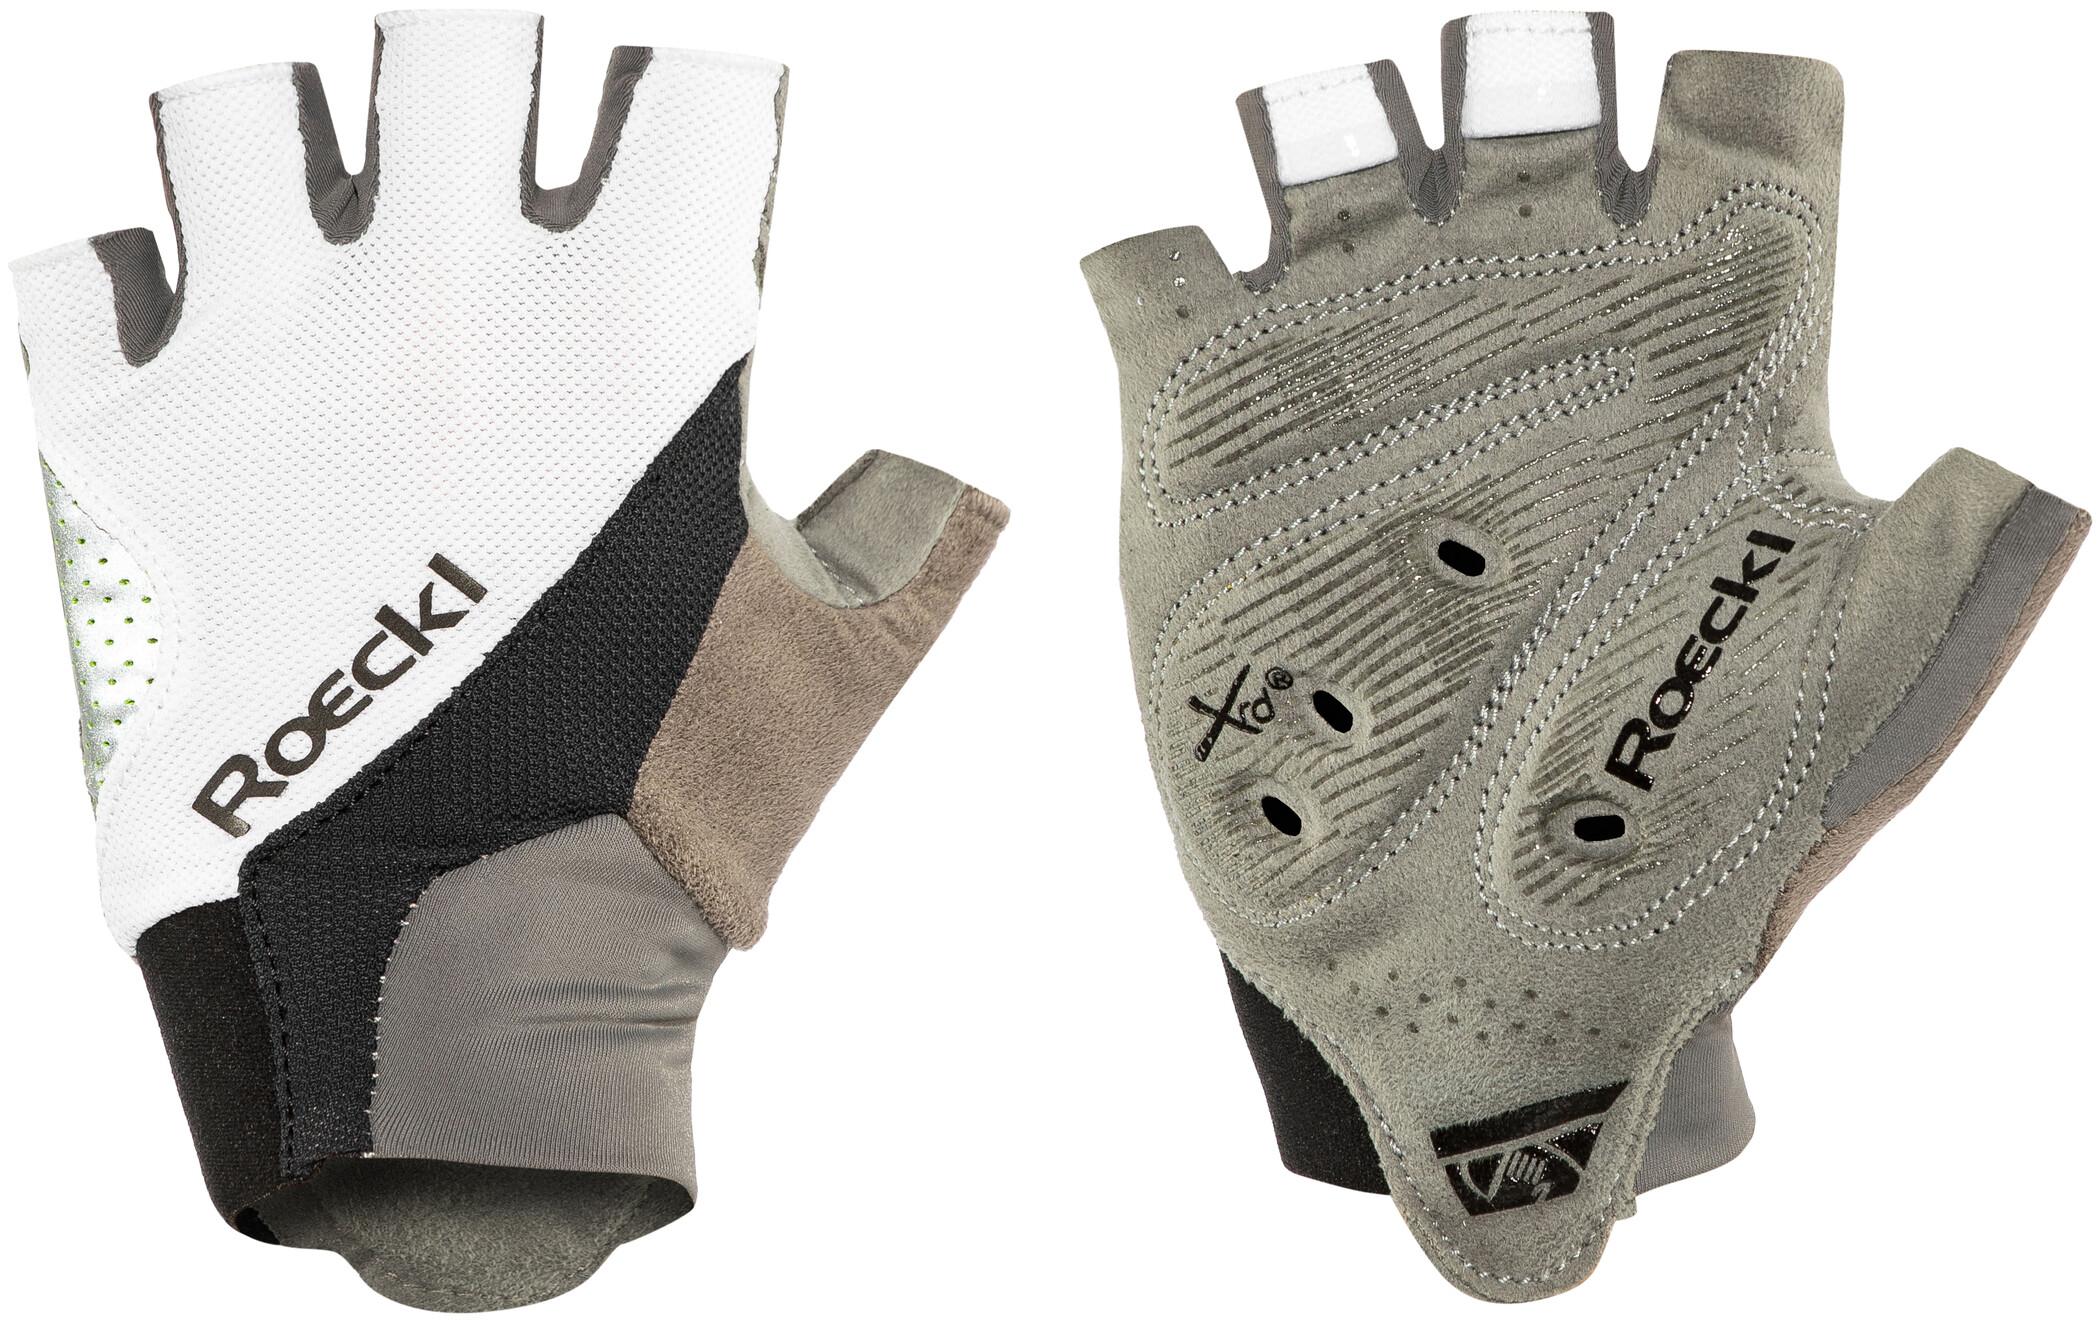 Roeckl Ivory Cykelhandsker, white/black (2019) | Gloves